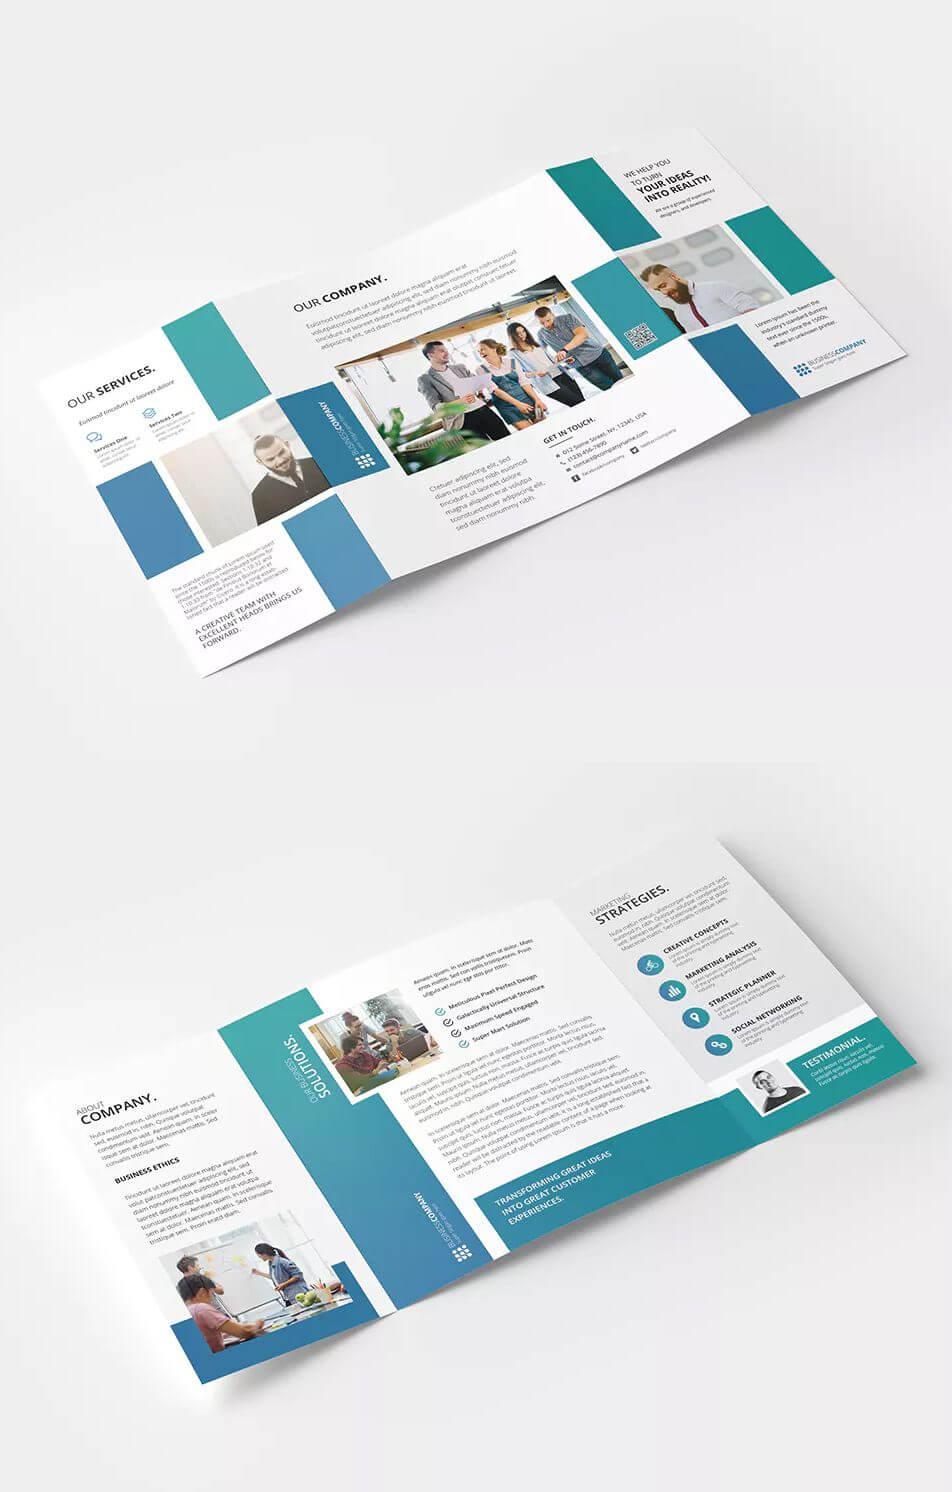 Square Gate Fold Brochure Template Psd - Cmyk Color Mode Throughout Gate Fold Brochure Template Indesign